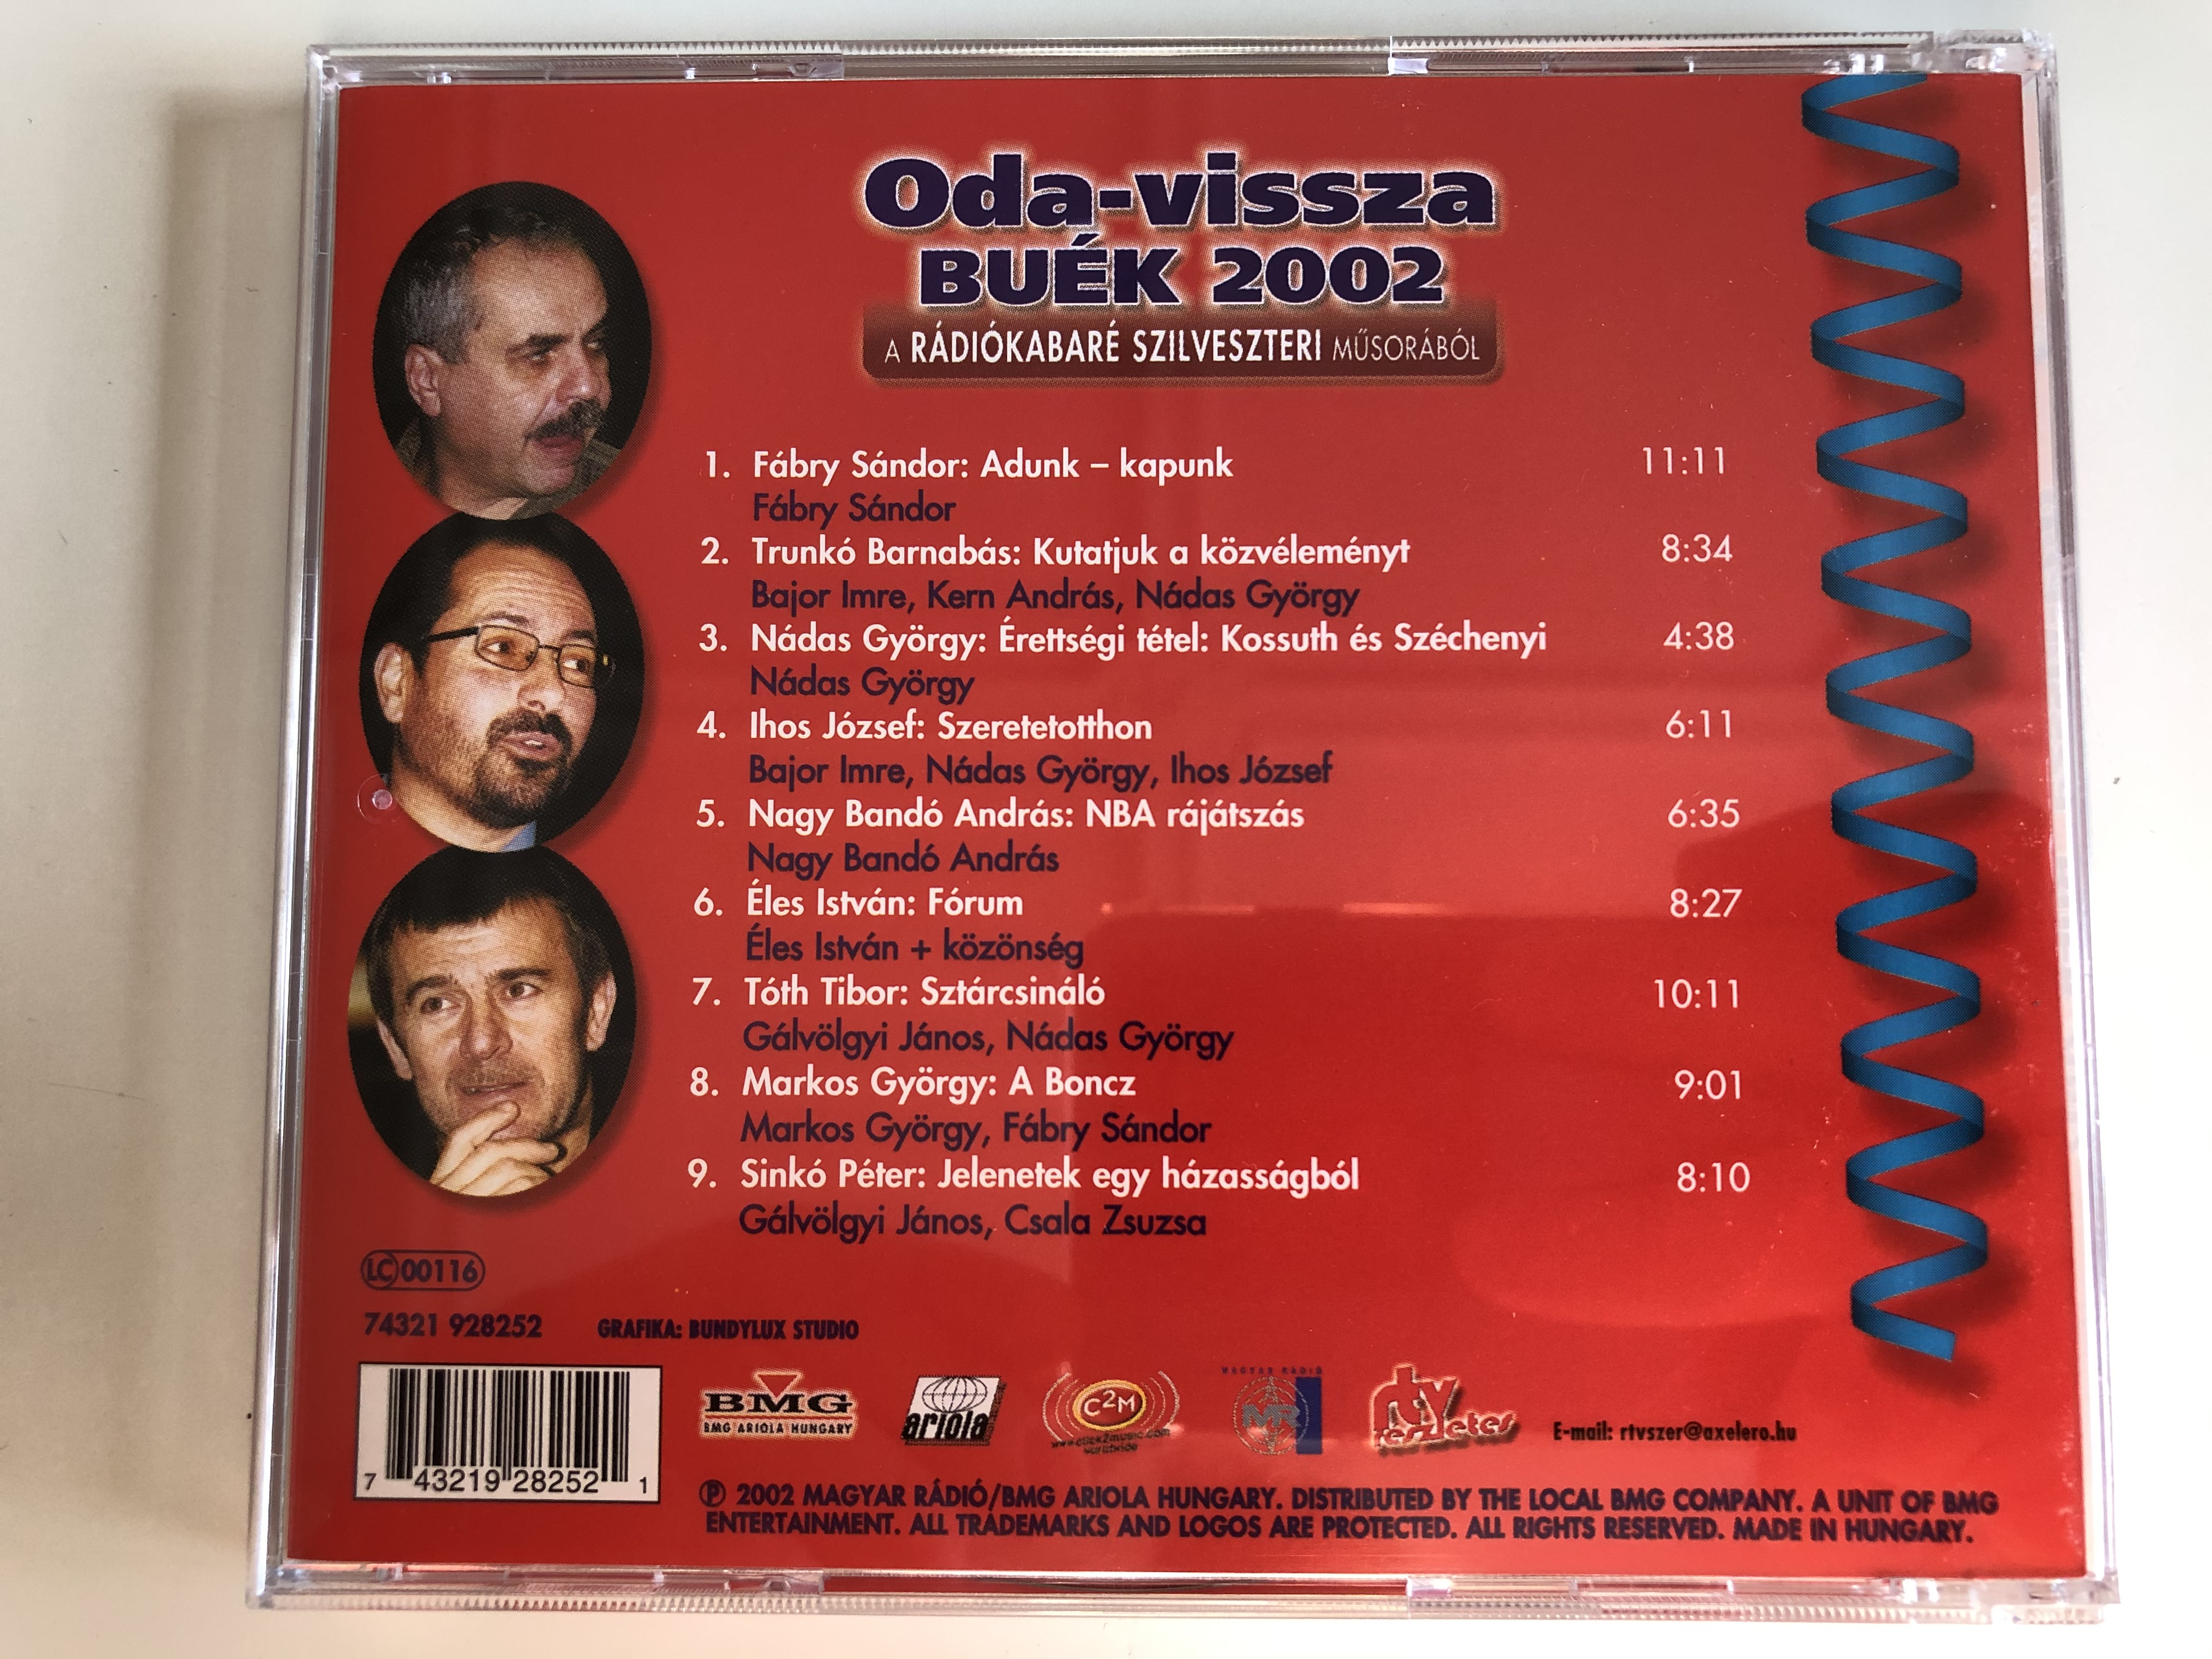 oda-vissza-buek-2002-a-radiokabare-szilveszteri-musorabol-szovivo-fabry-sandor-szerkeszto-rendezo-farkashazy-tivadar-es-sinko-peter-magyar-radio-audio-cd-2002-74321-928252-5-.jpg